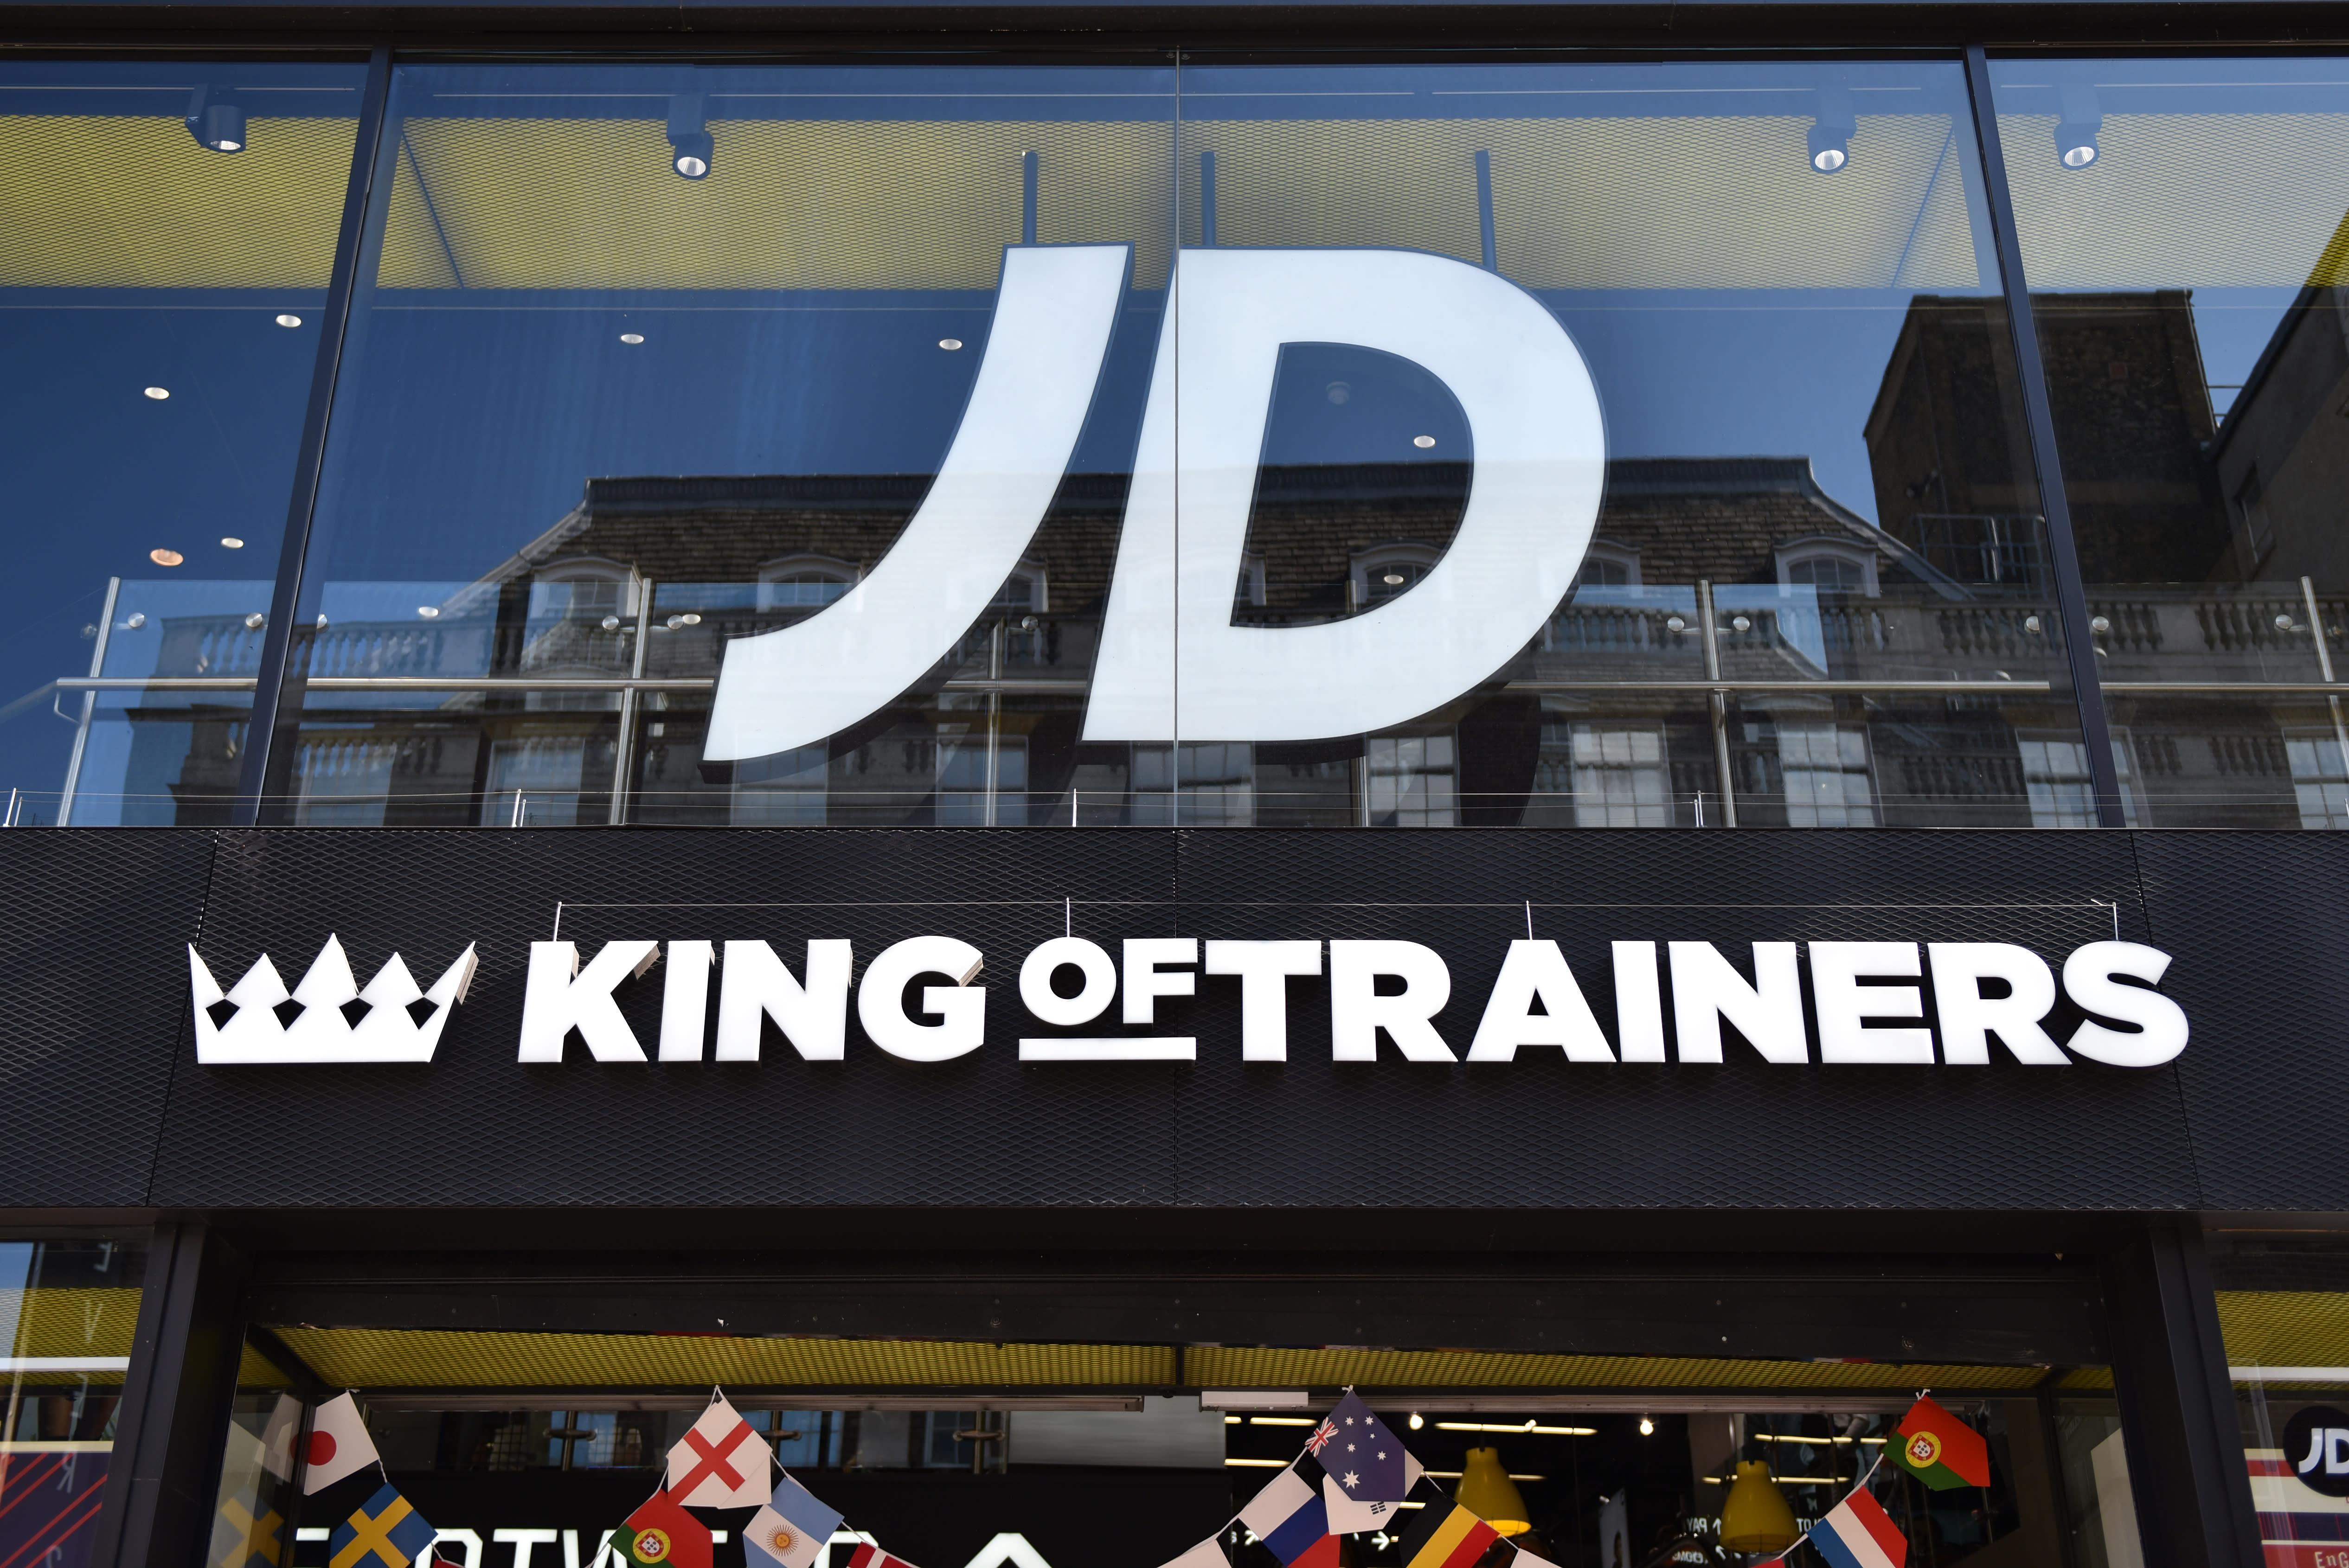 cma warns jd sports takeover of footasylum could be bad for shoppers cma warns jd sports takeover of footasylum could be bad for shoppers